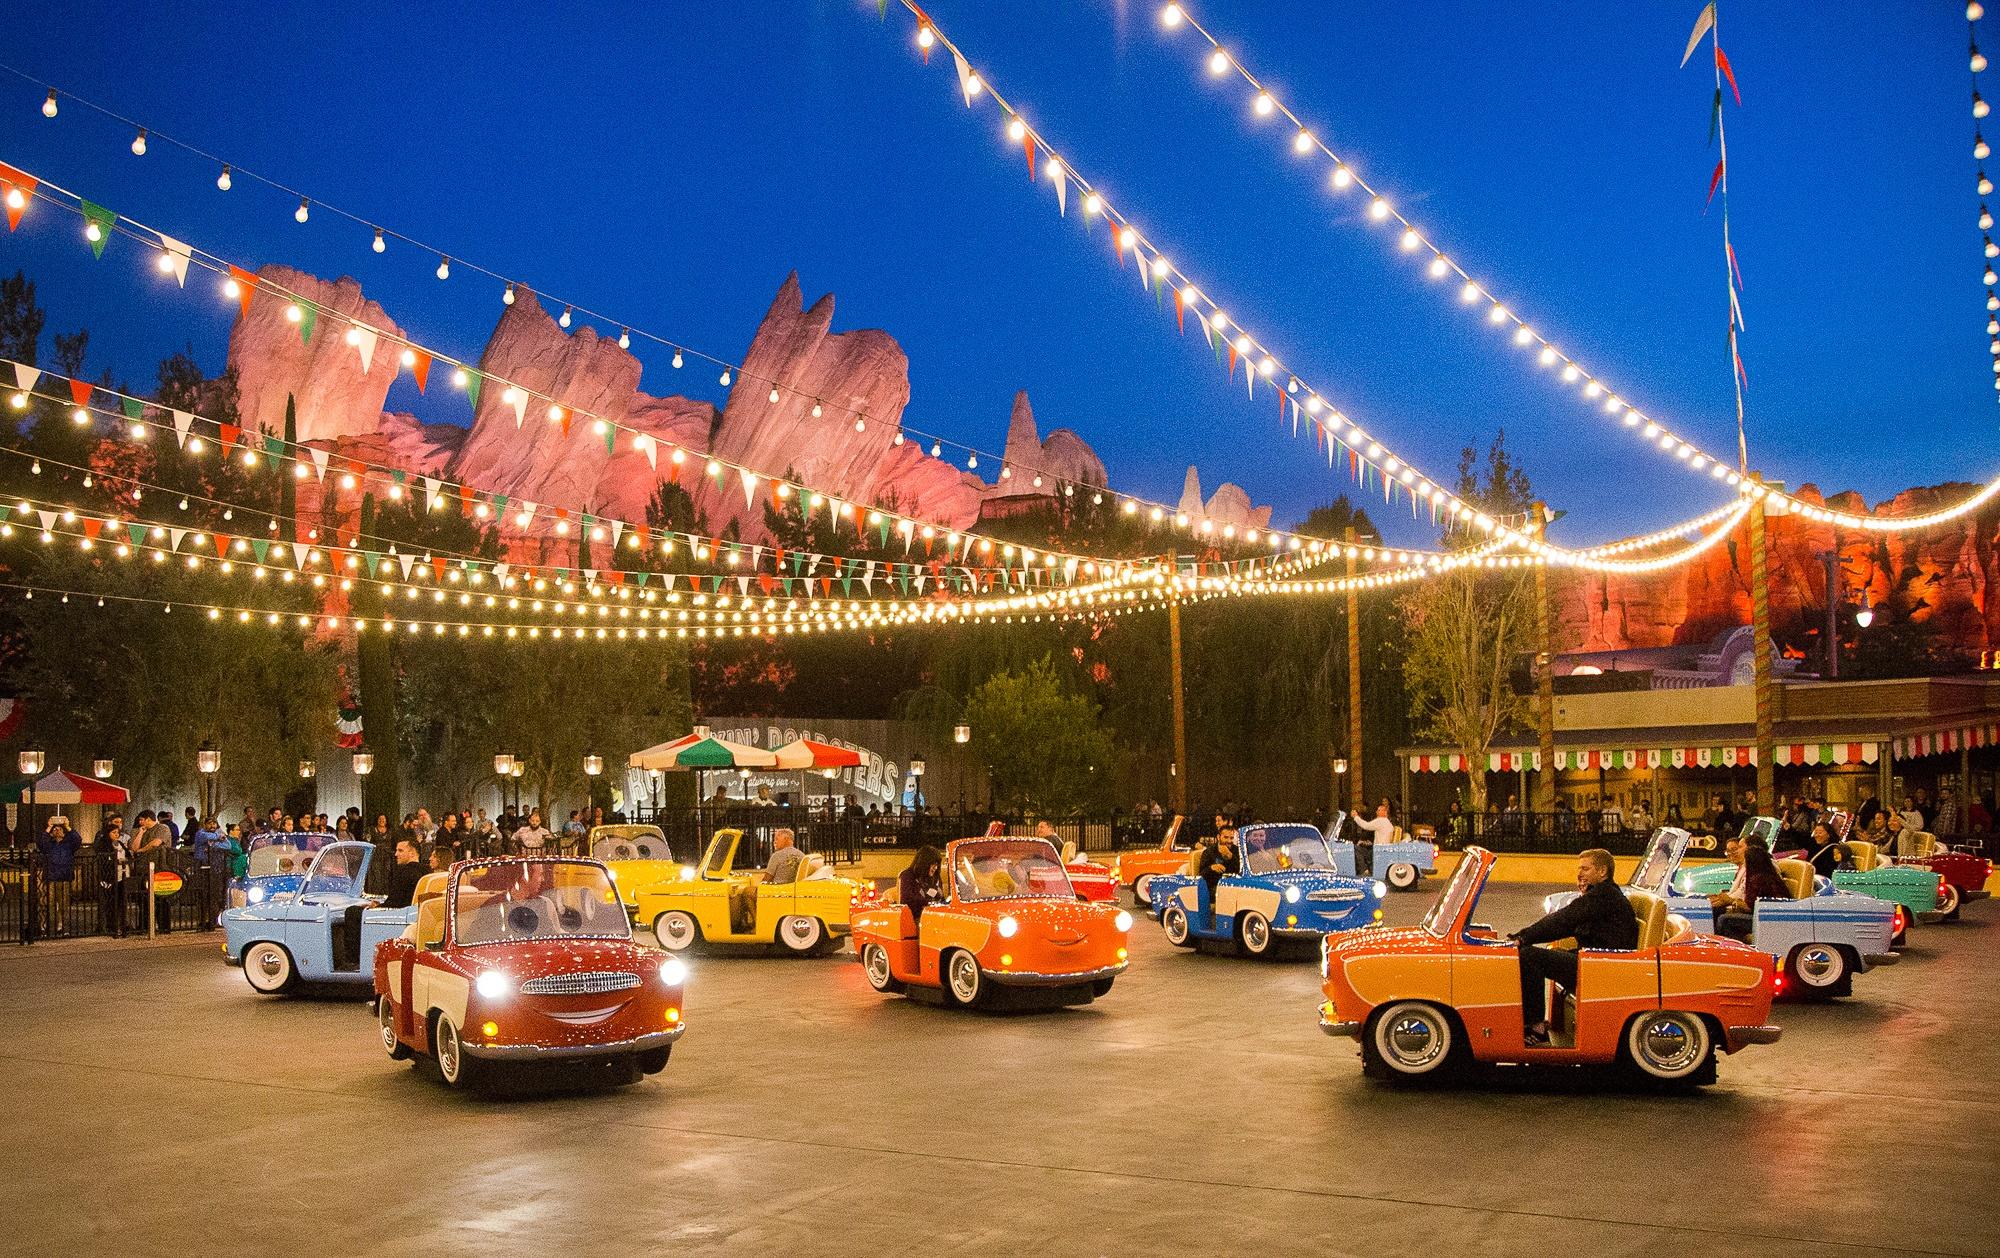 Luigi's Rollickin' Roadsters in Cars Land Disney theme park